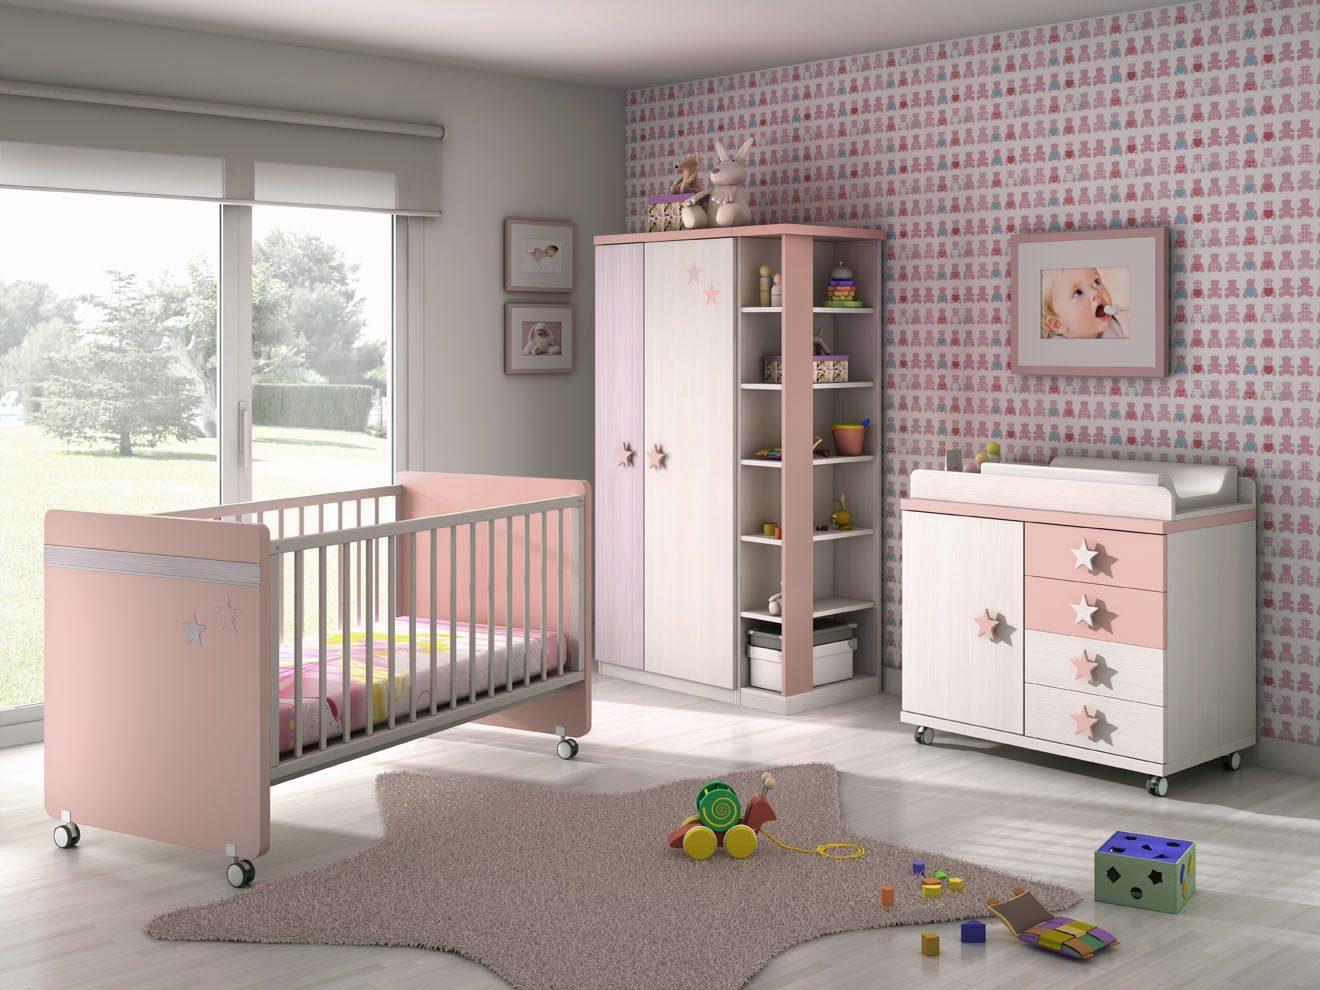 Habitaciones de beb s - Habitaciones de bebes decoracion ...